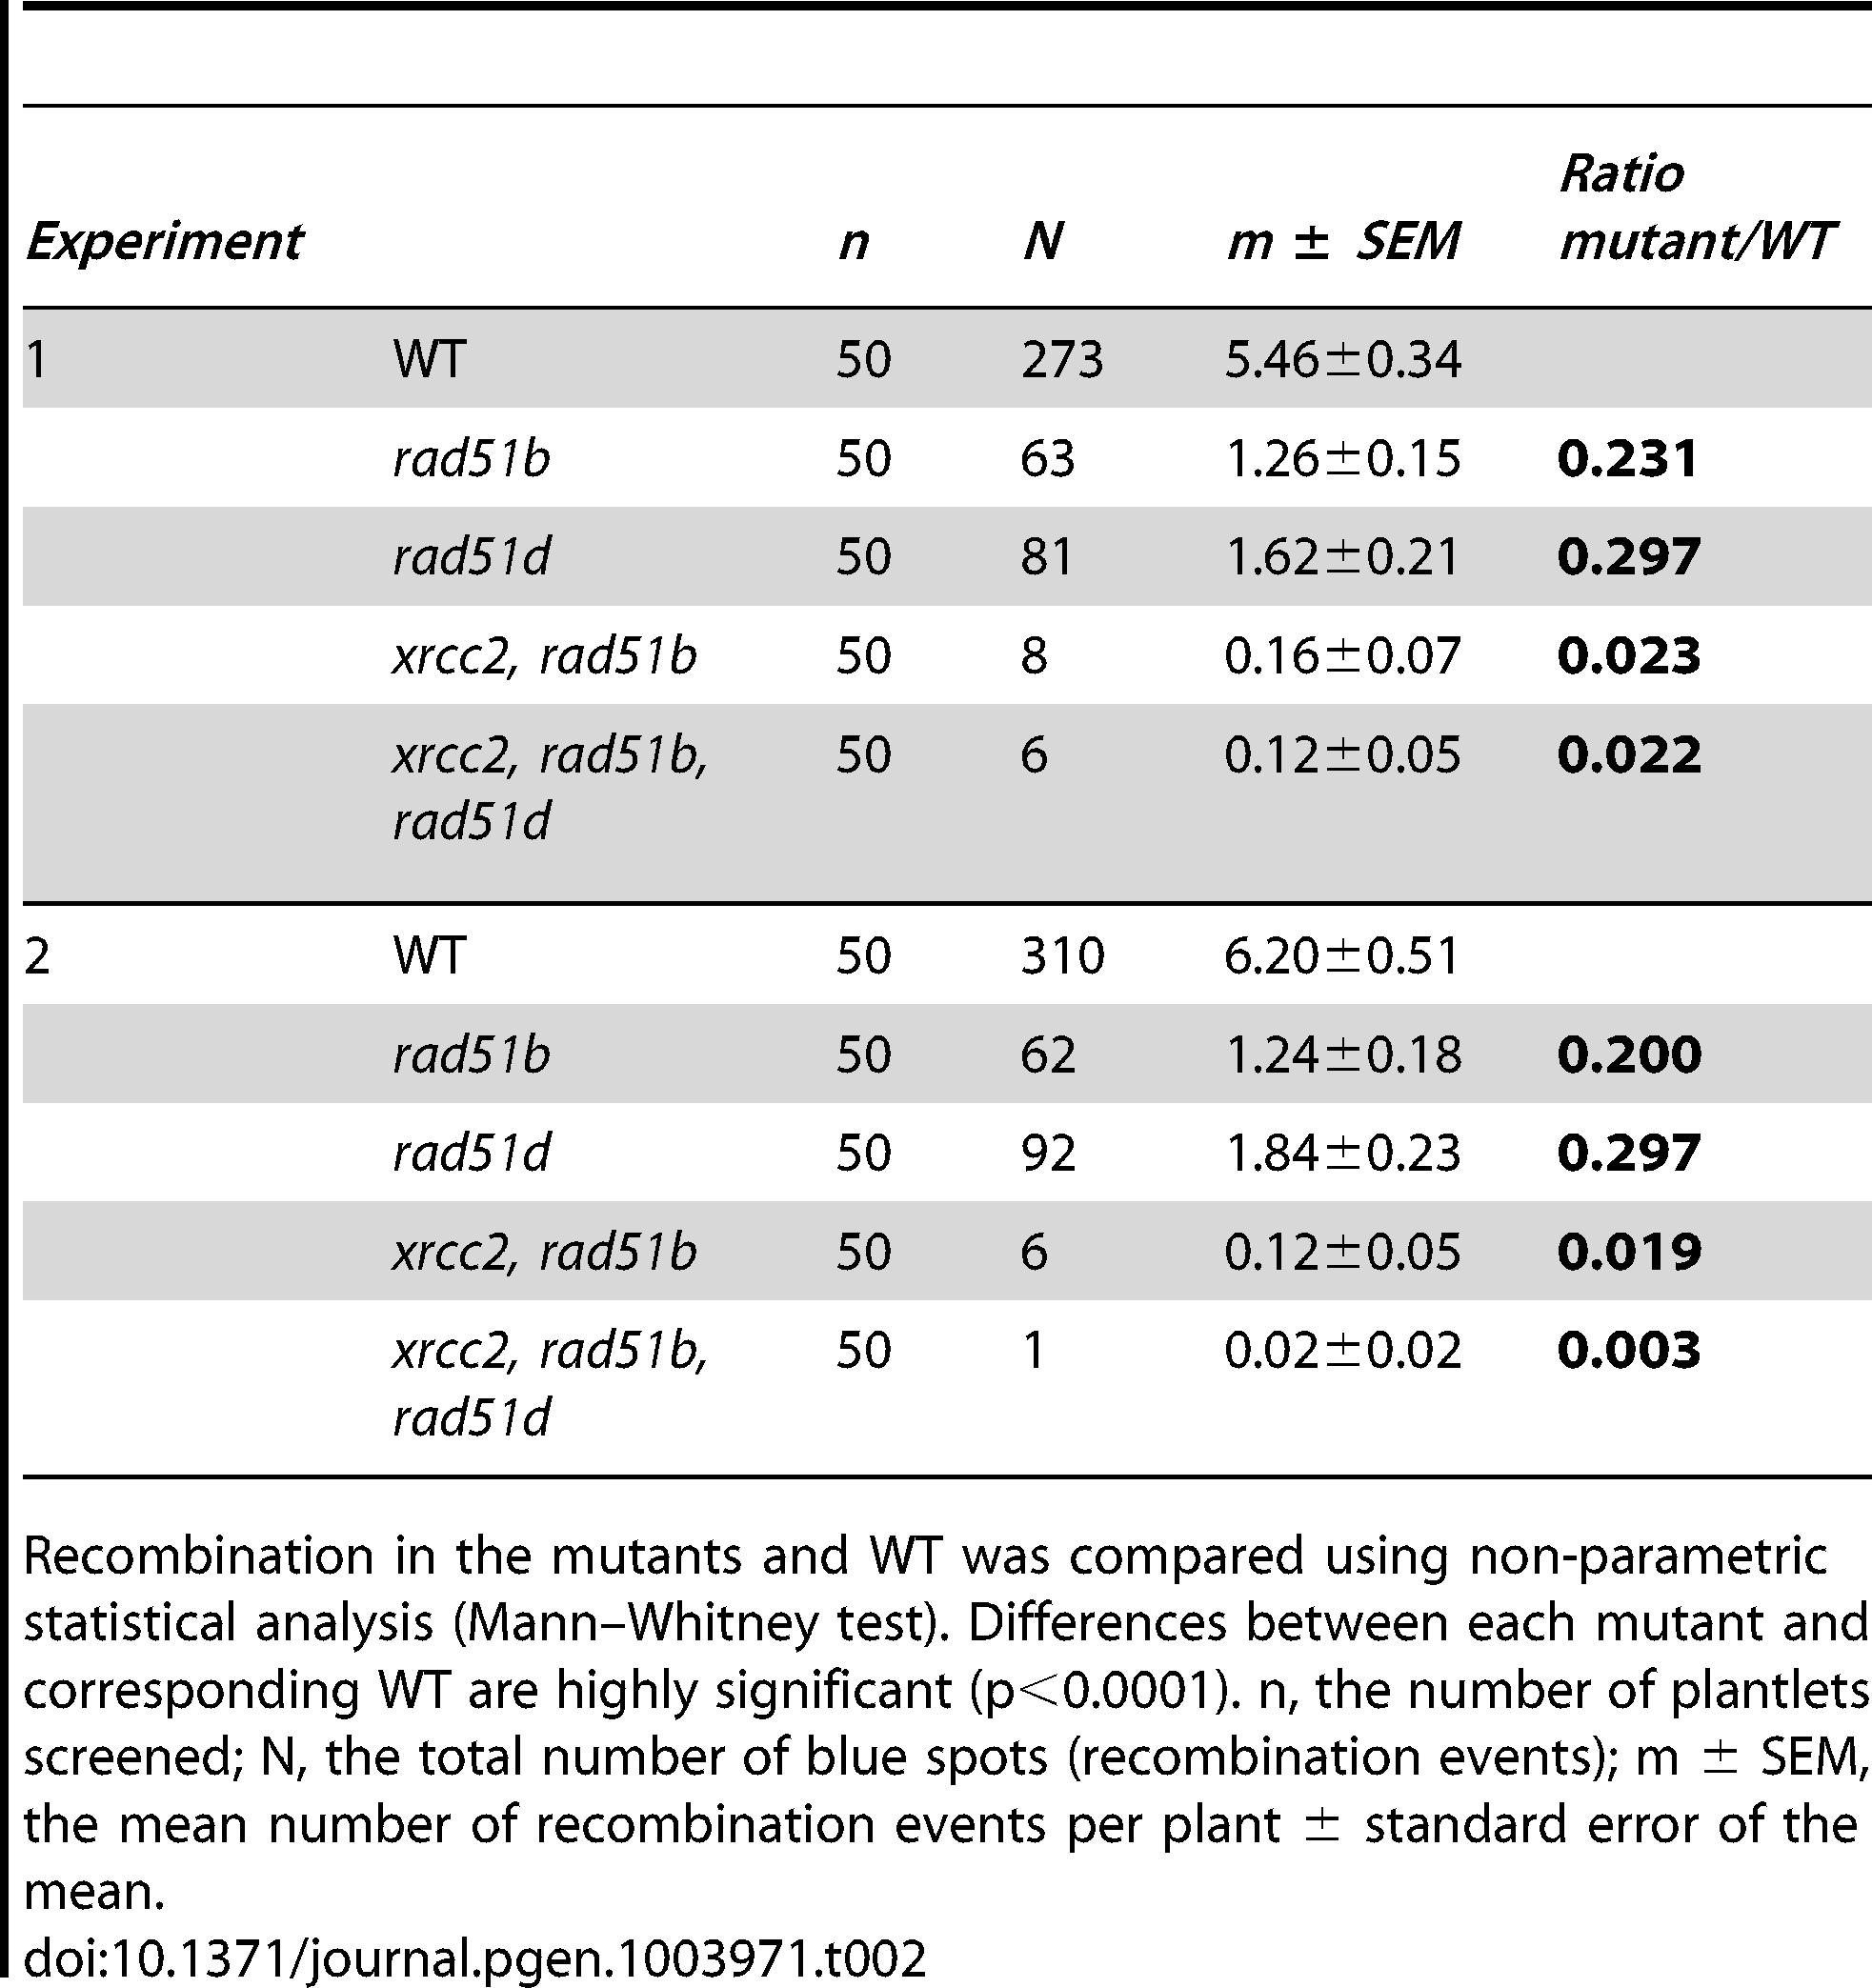 Spontaneous DGU.US recombination in wild-type, <i>rad51b</i>, <i>rad51d</i>, double and triple mutants.